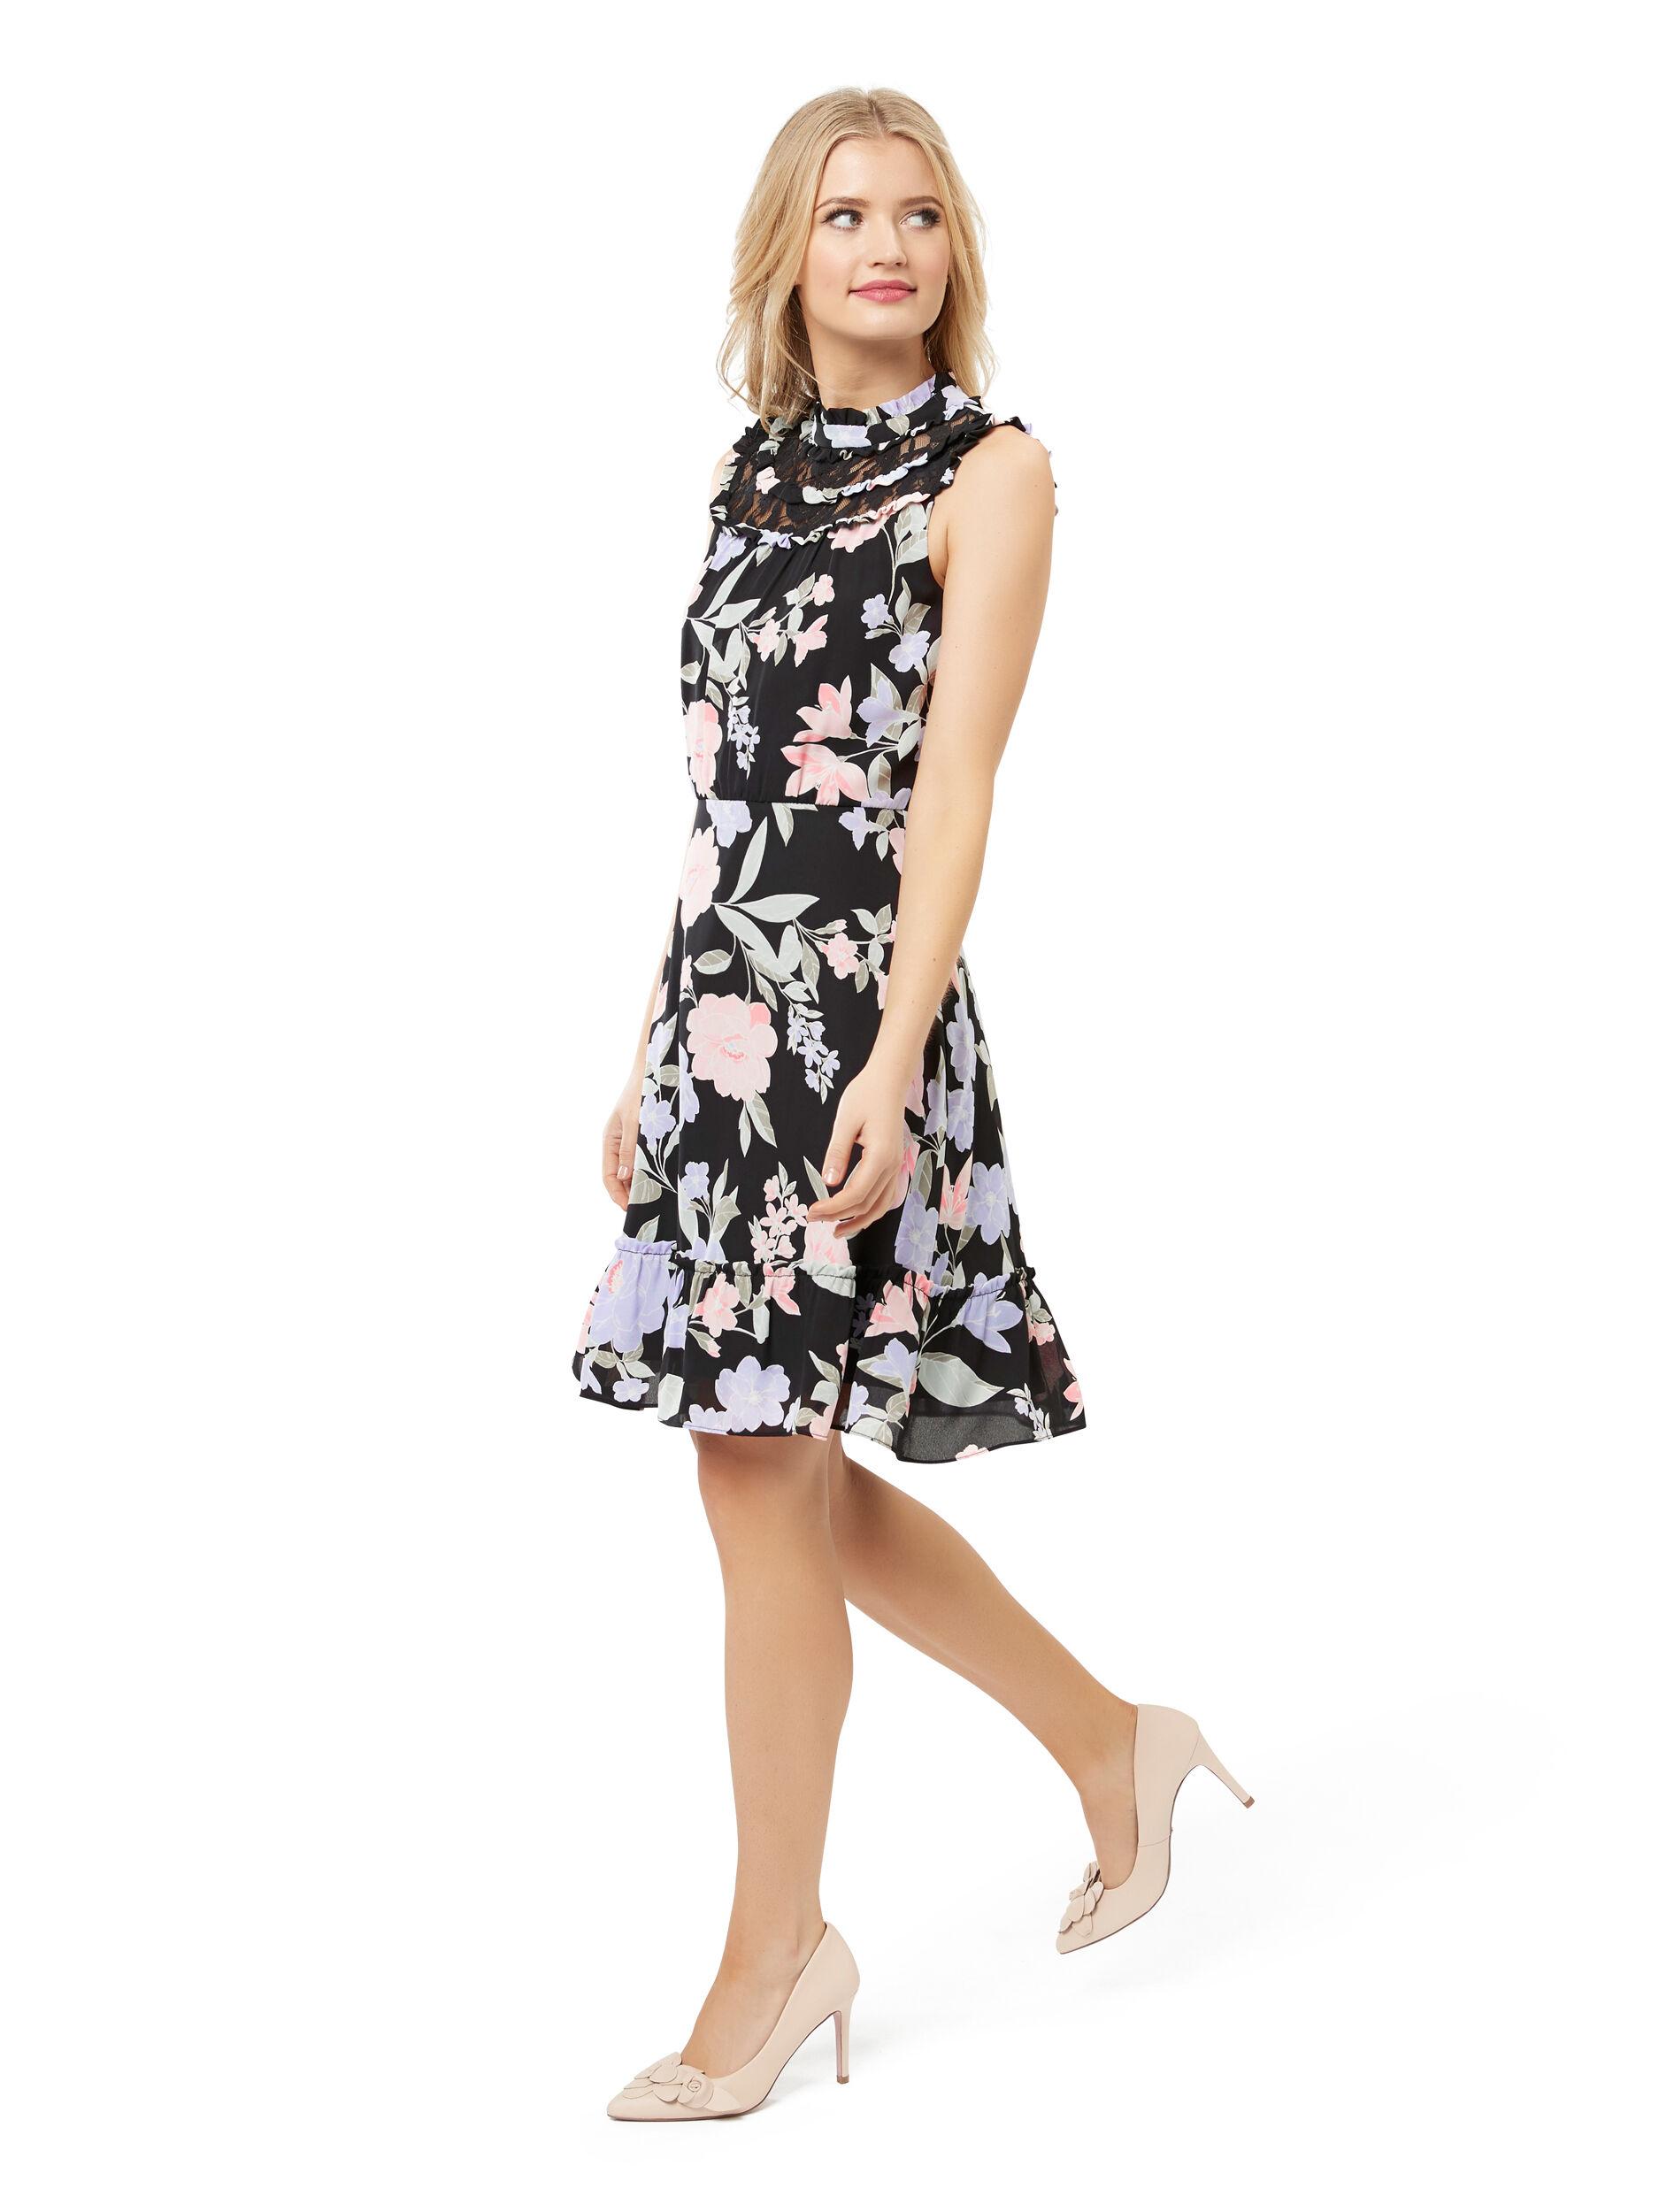 5b9550828 Wonderland Dreams Dress | Shop Dresses Online from Review | Review ...